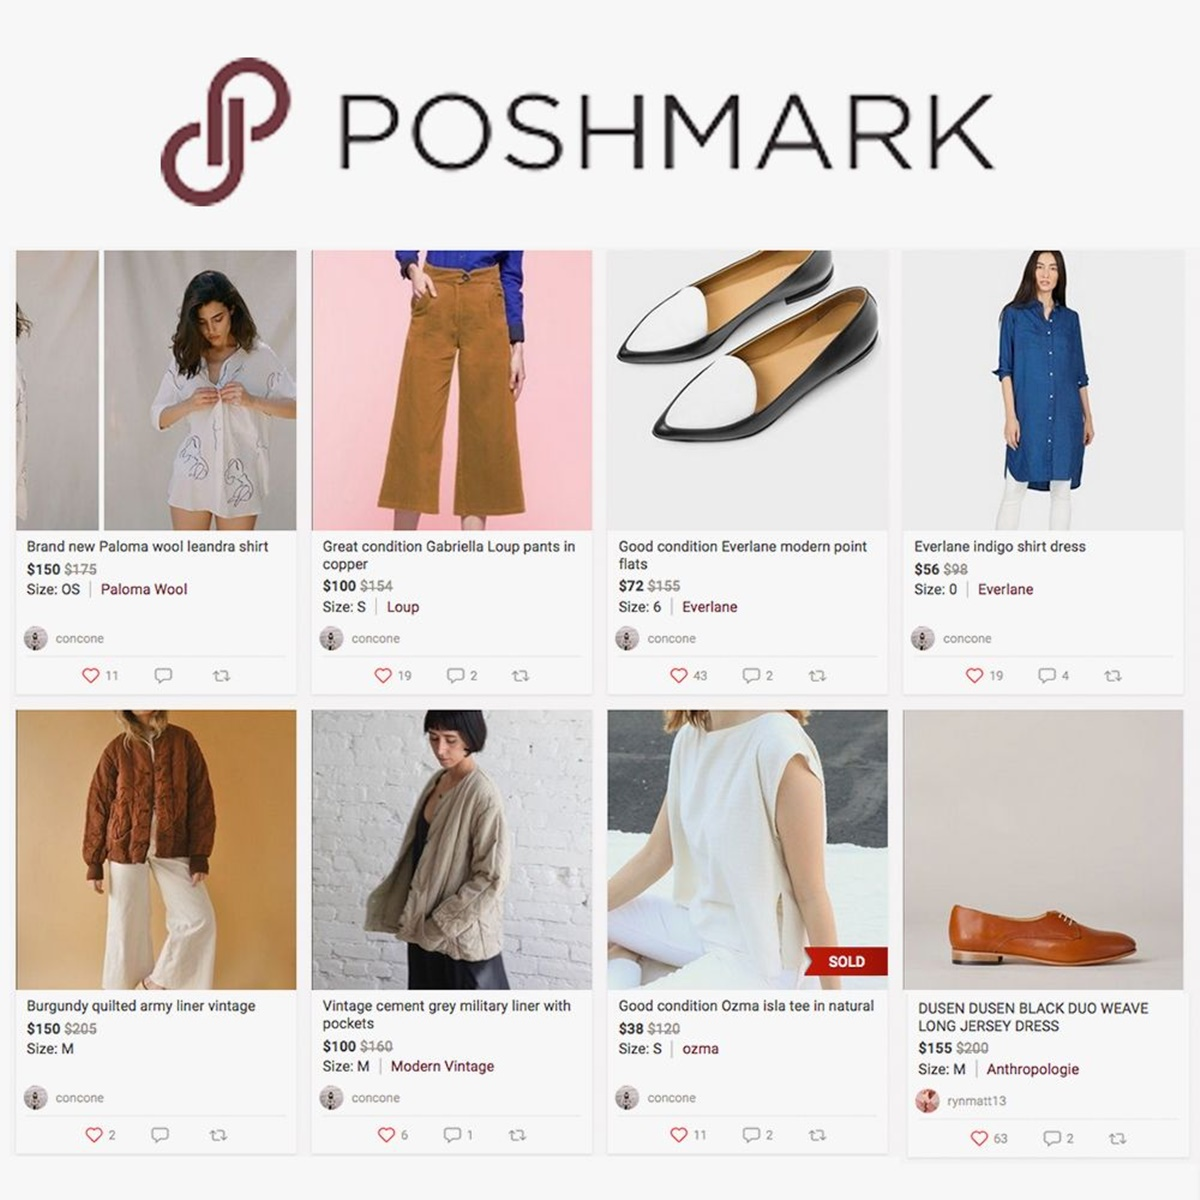 Products on Poshmark